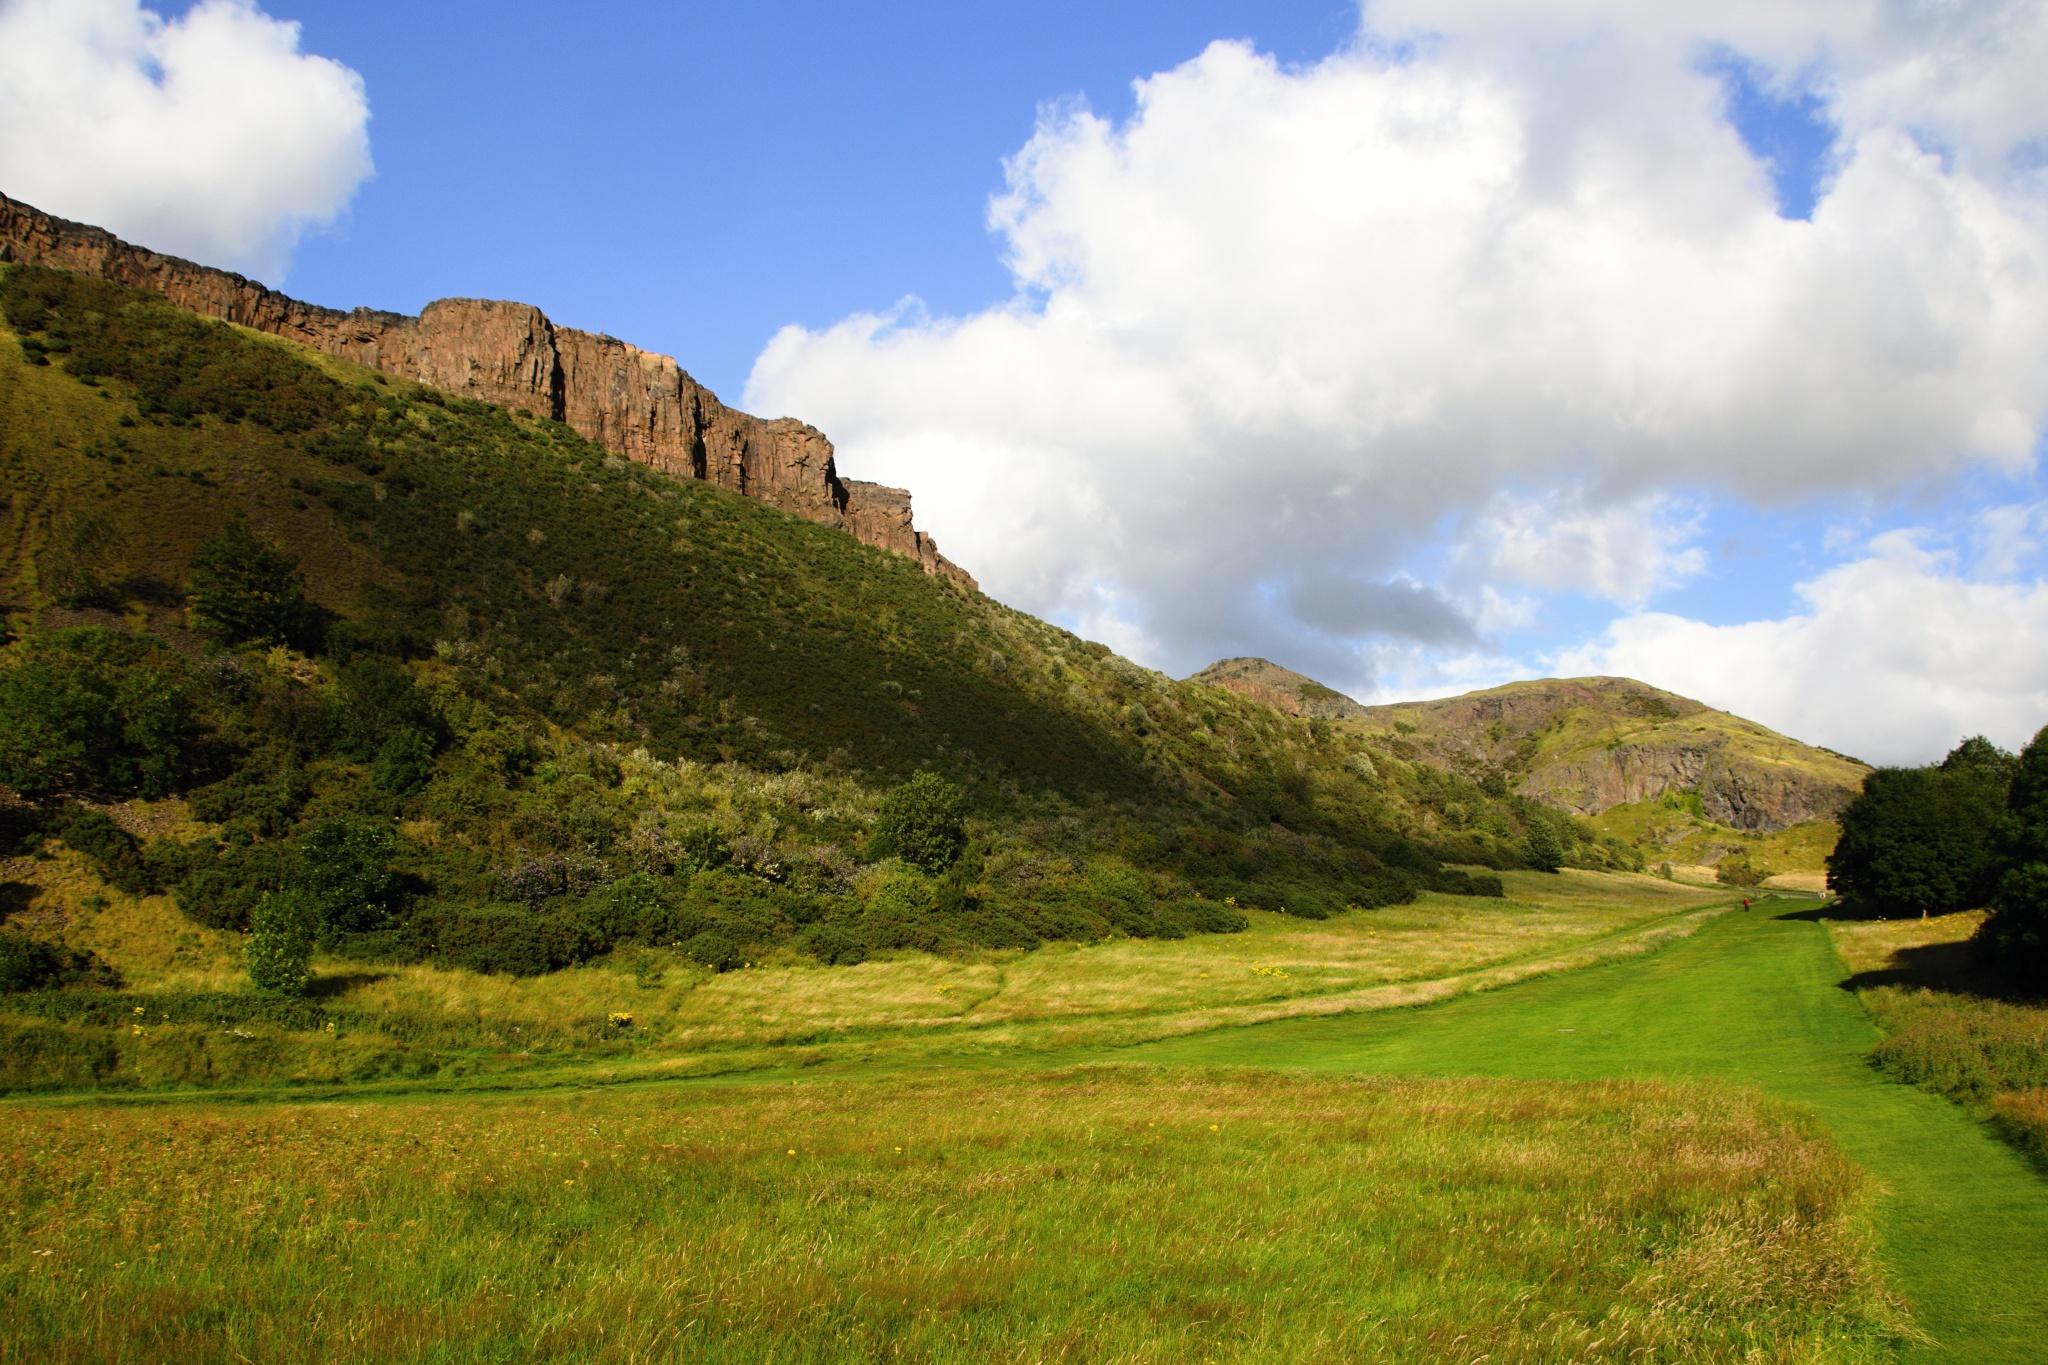 Útes zvaný Salisbury Crags nad Edinburghem